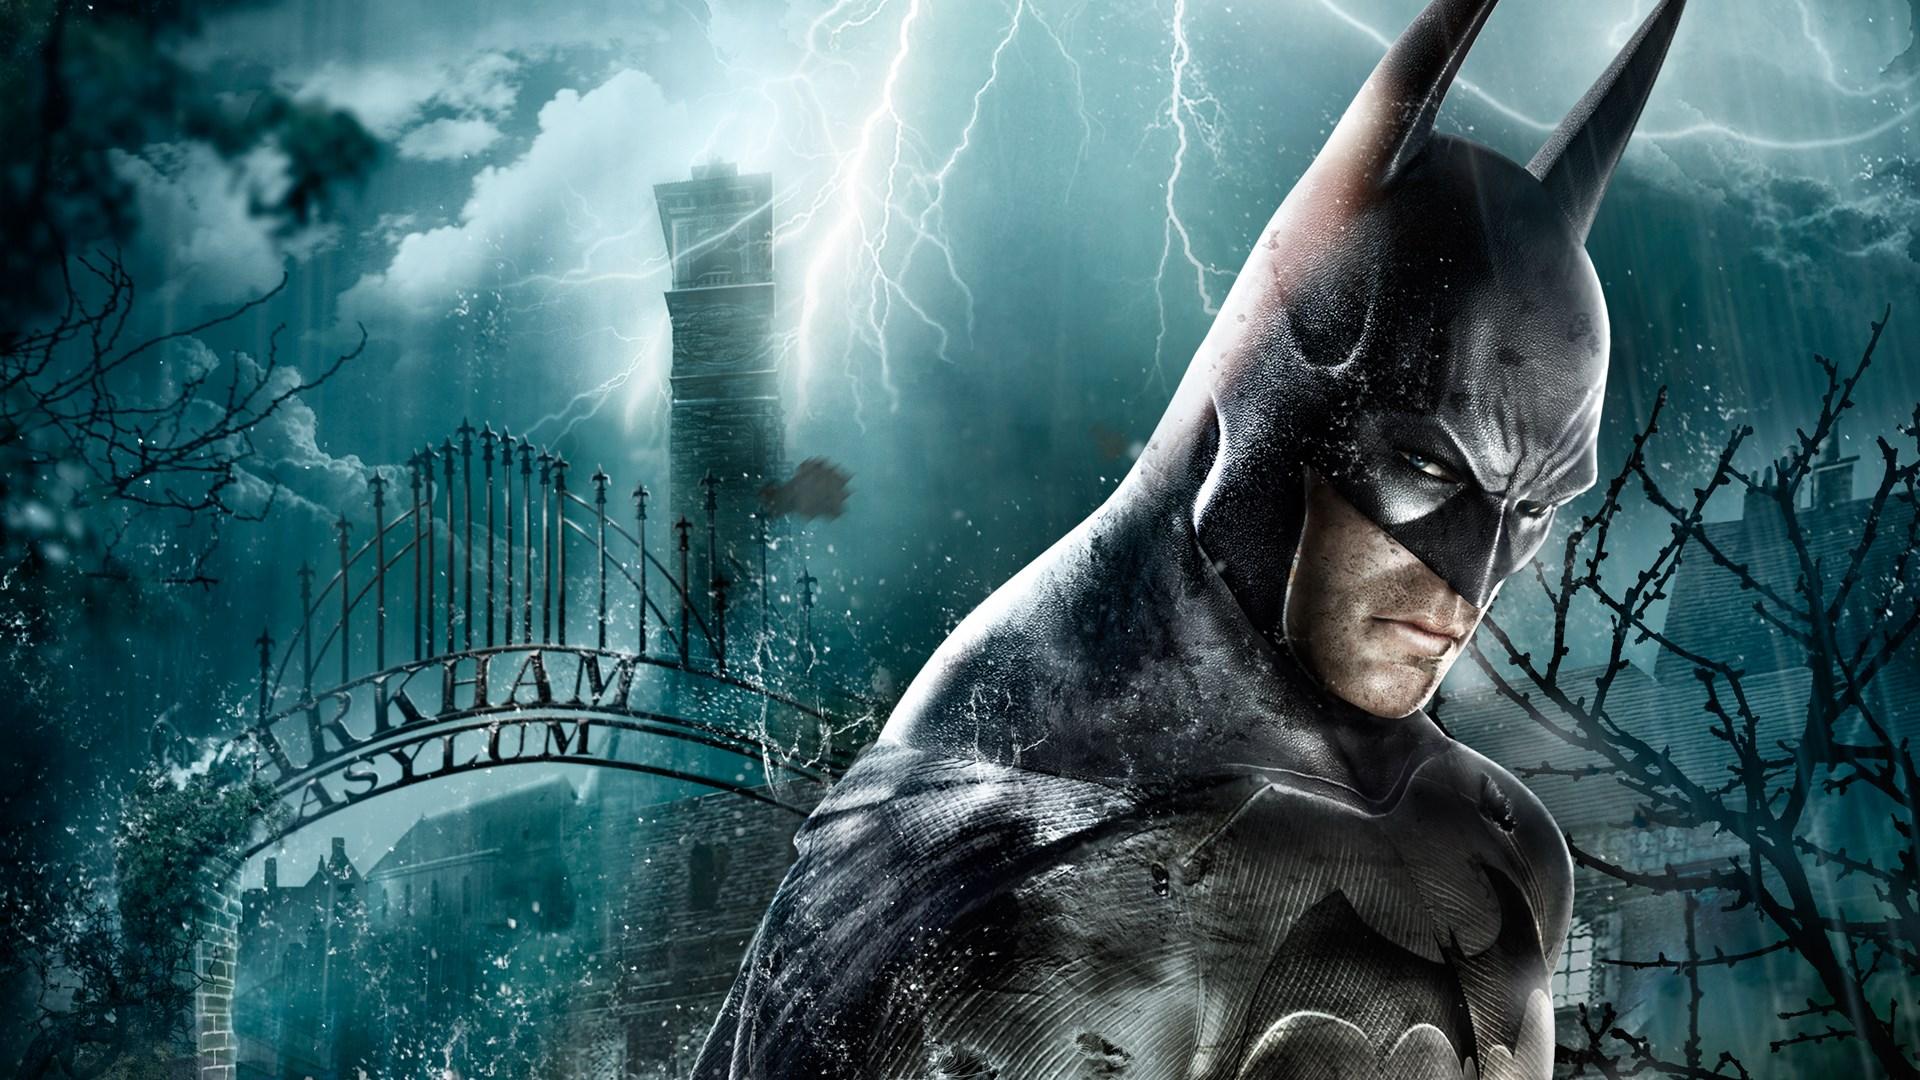 Buy Batman: Return to Arkham - Arkham Asylum - Microsoft Store